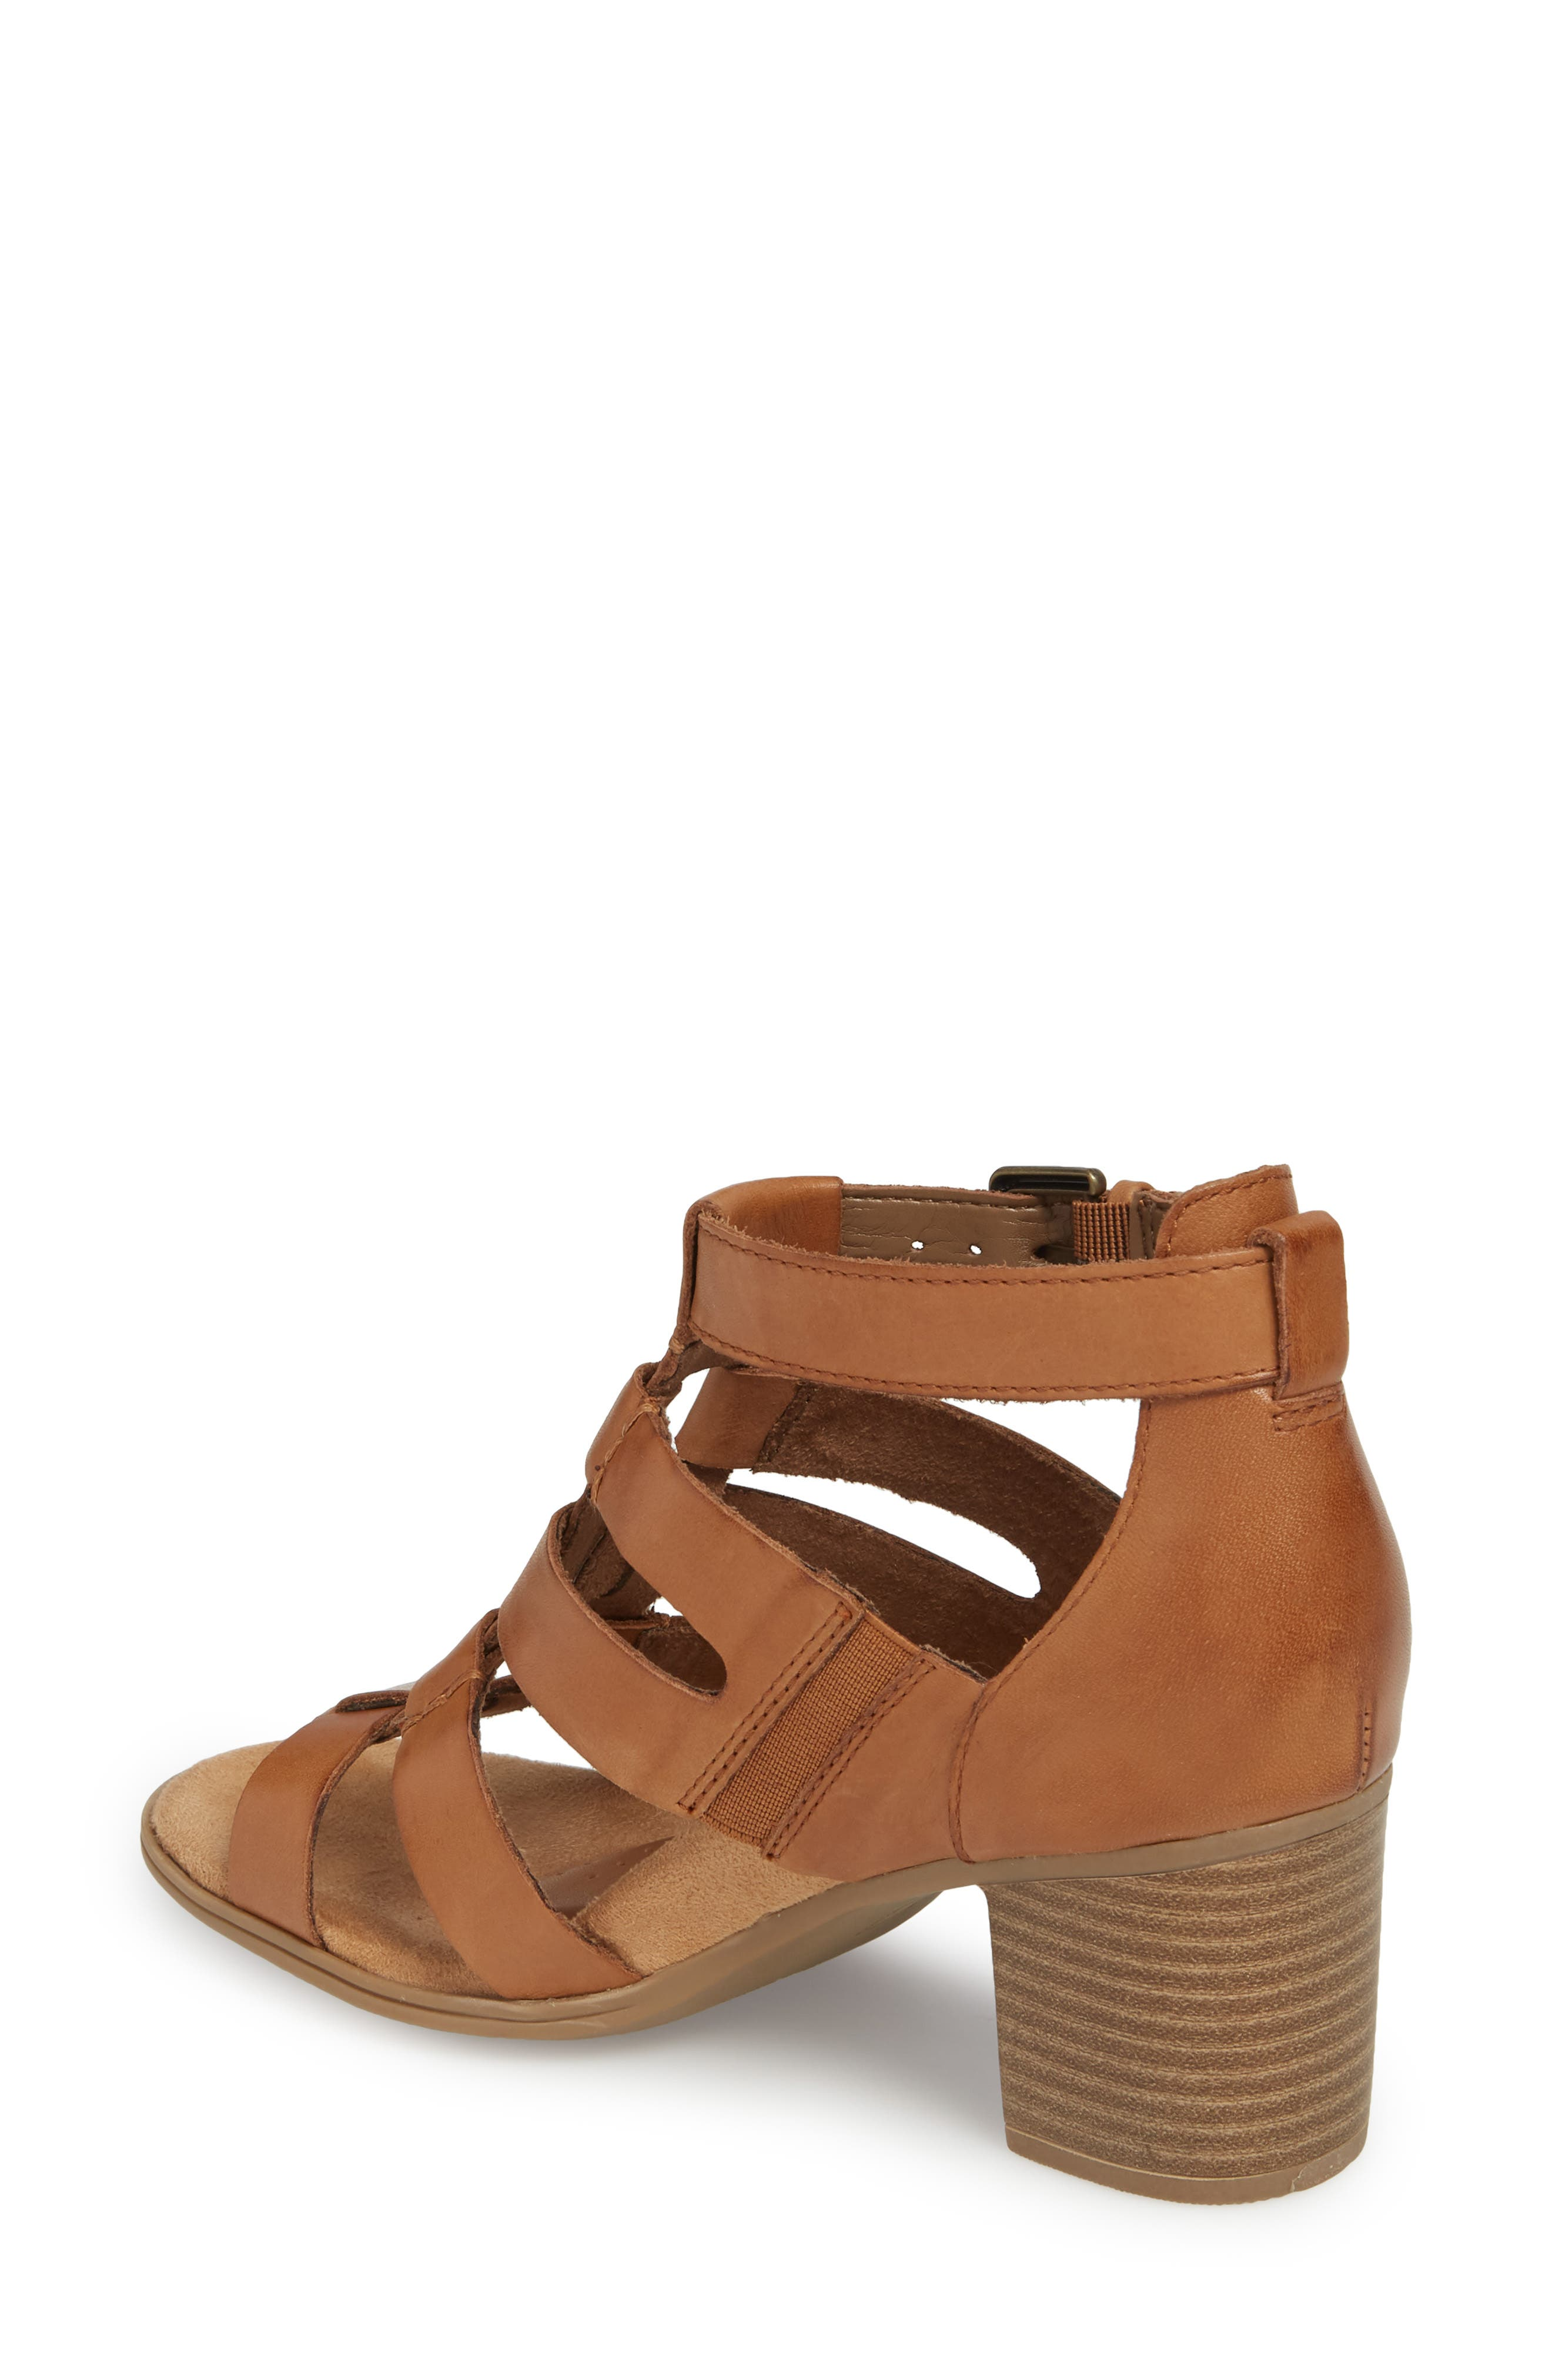 Hattie Block Heel Gladiator Sandal,                             Alternate thumbnail 2, color,                             231